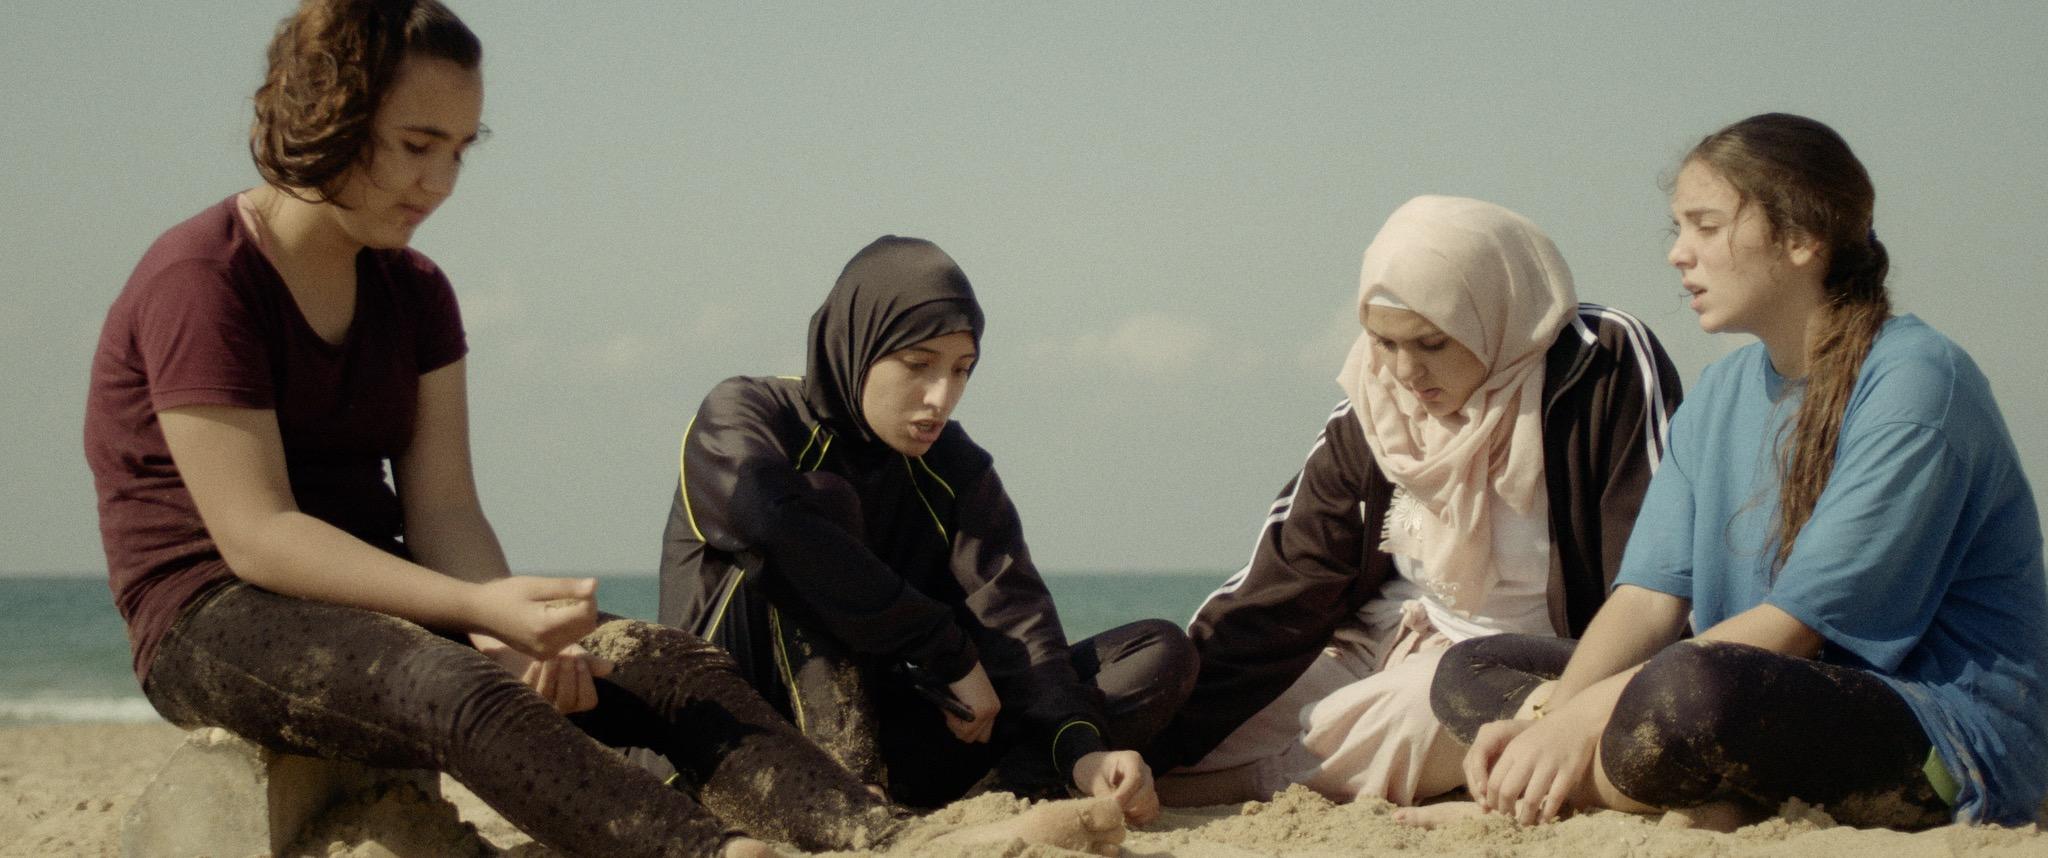 Sisterhood: Beirut